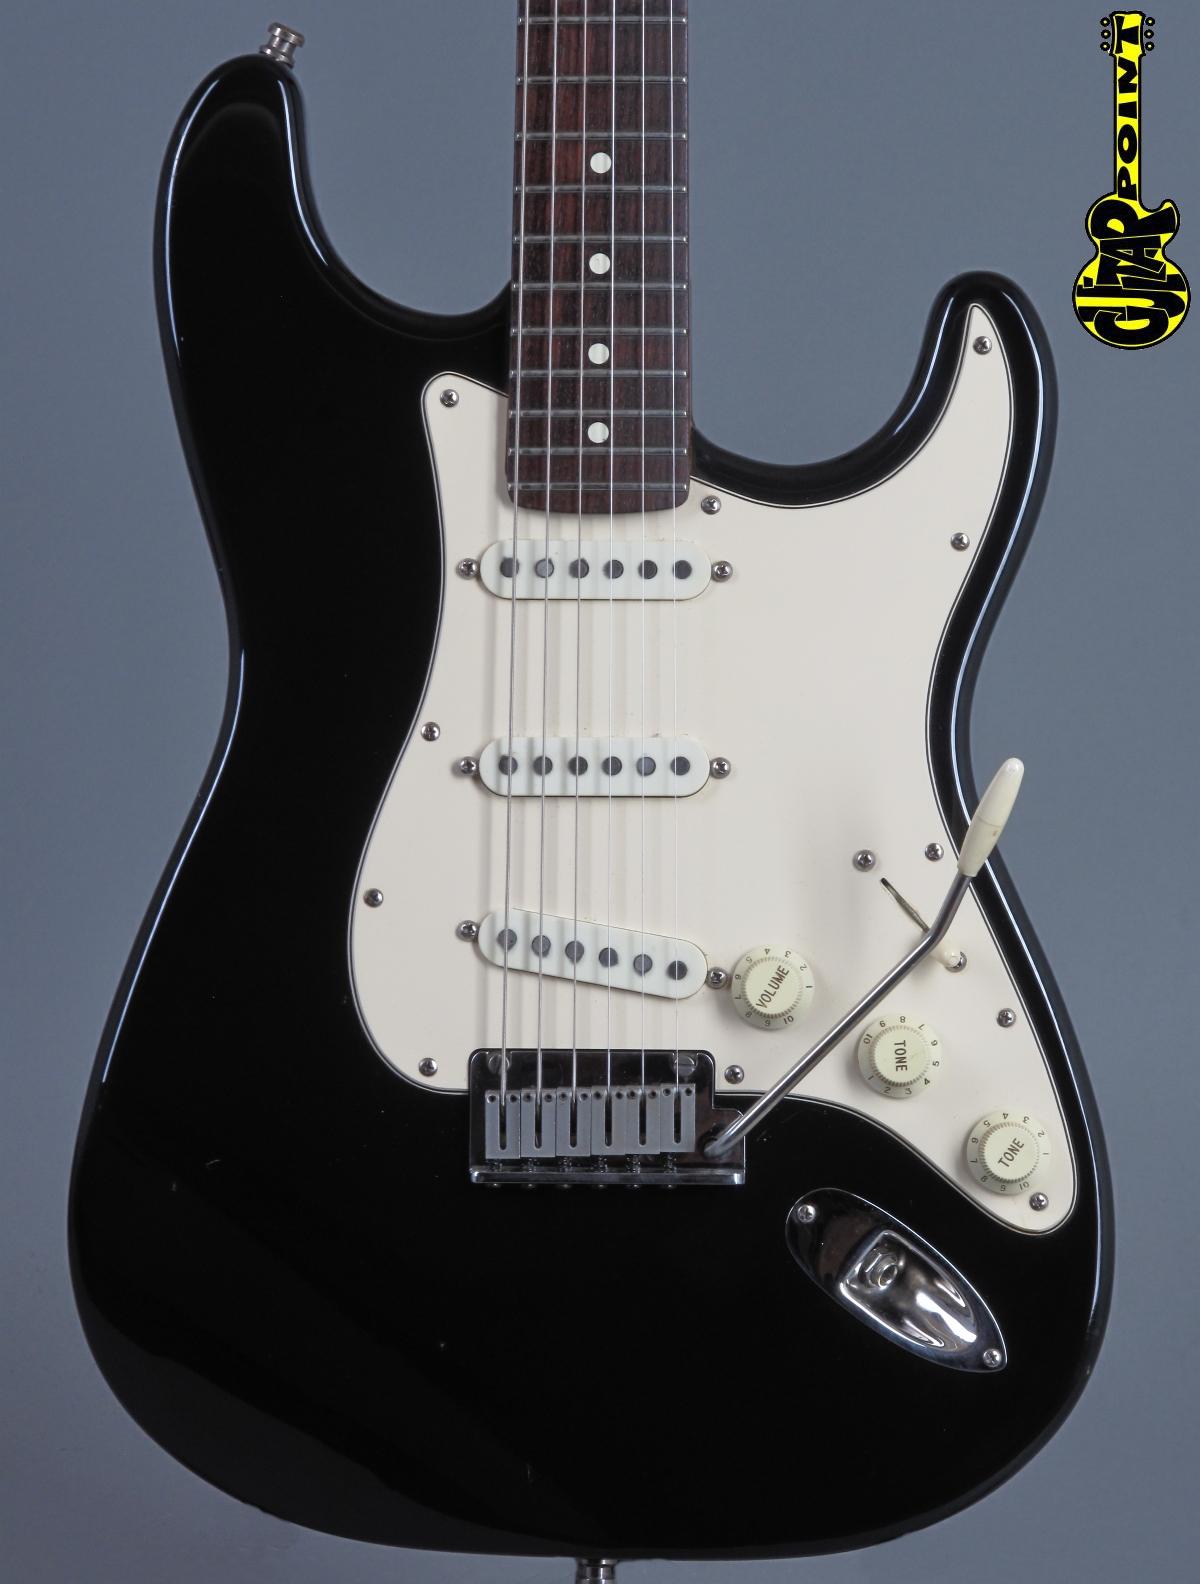 1989 Fender American Standard Stratocaster - Black